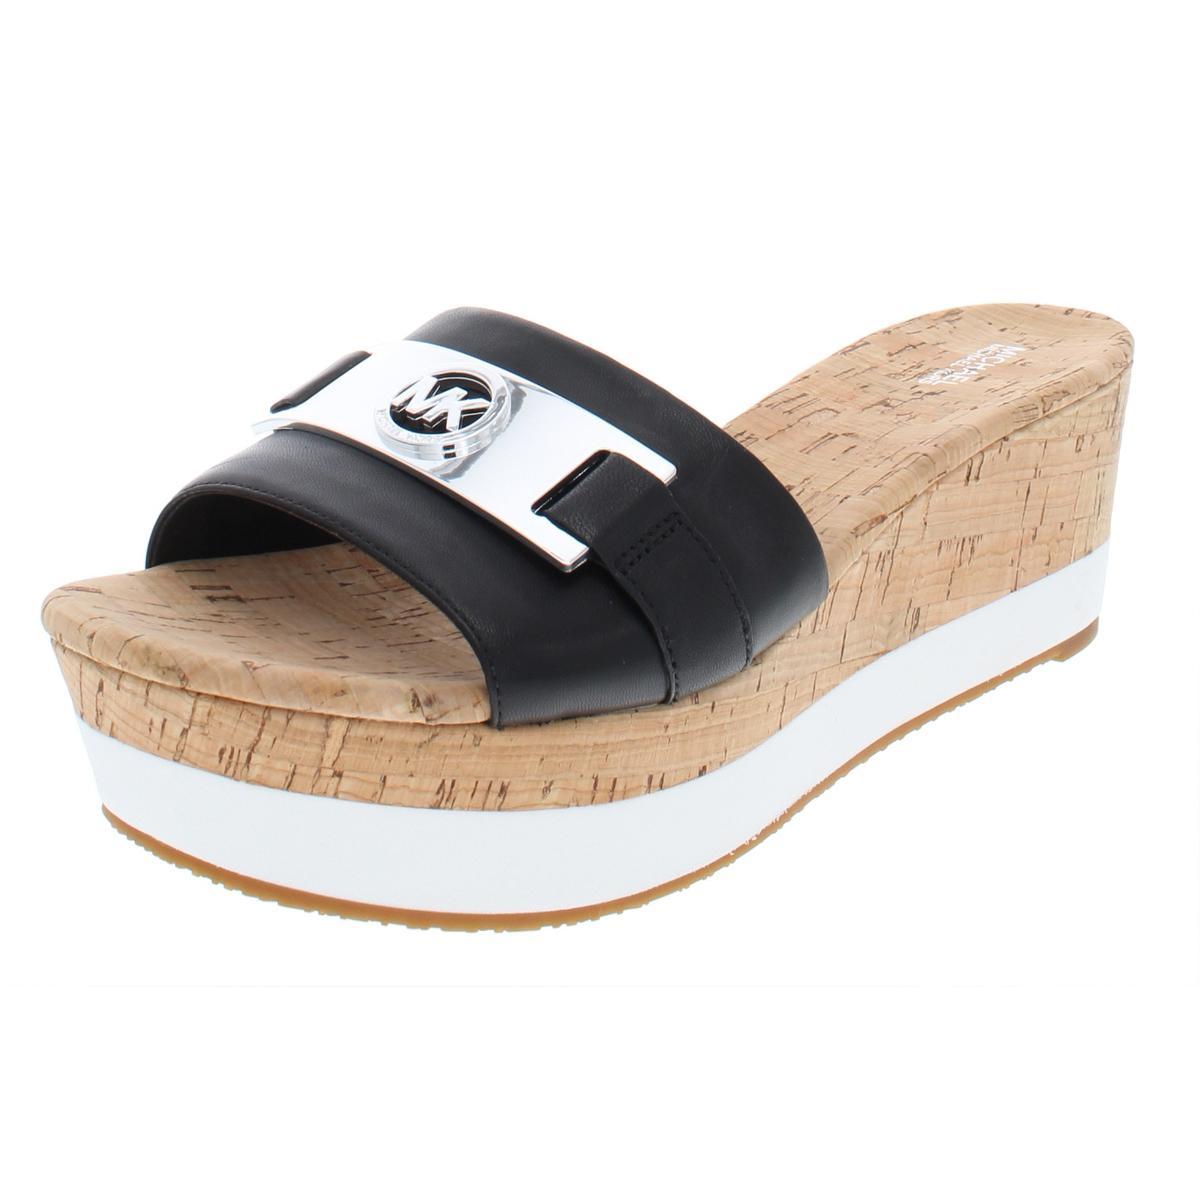 0085705950 Michael Kors Warren Womens Leather Wedge Platform Sandals